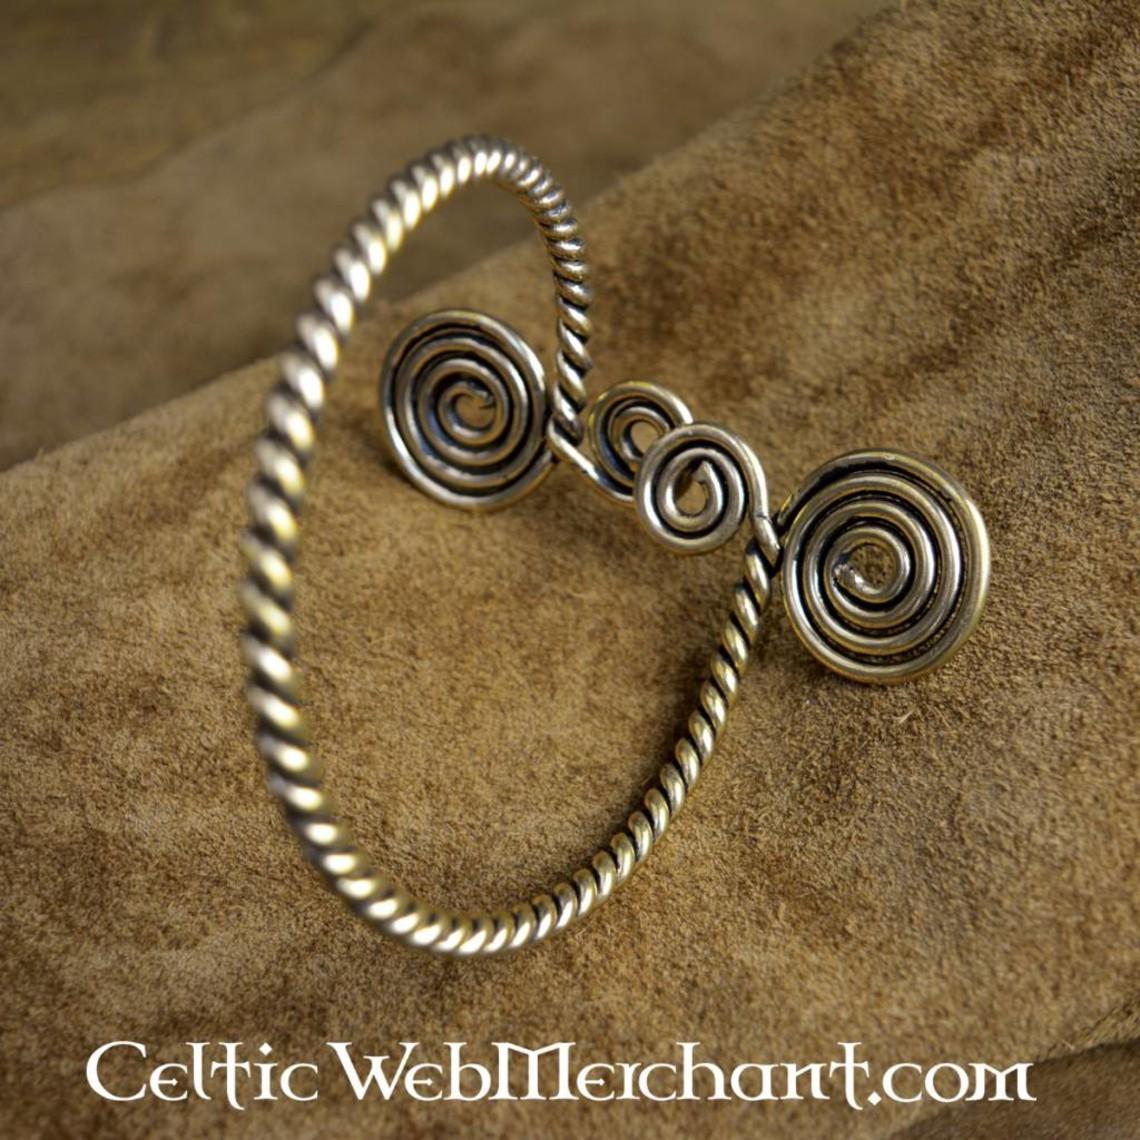 Celtic oberer Armband mit Spiralen